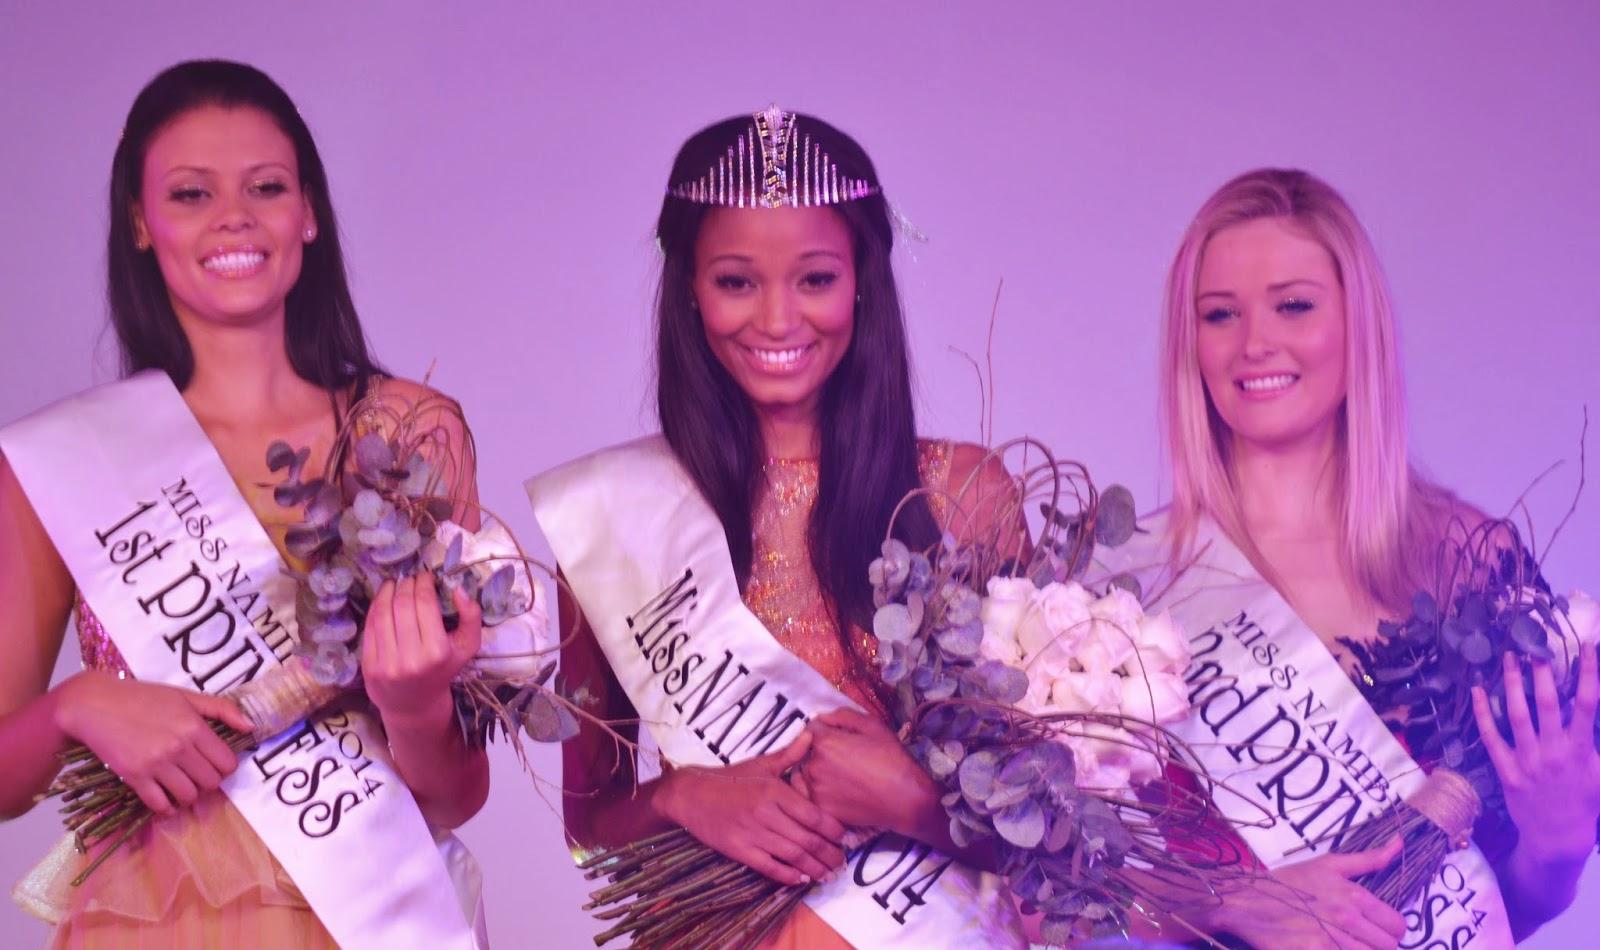 Miss Namibia 2014 winner Brumhilda Ochs